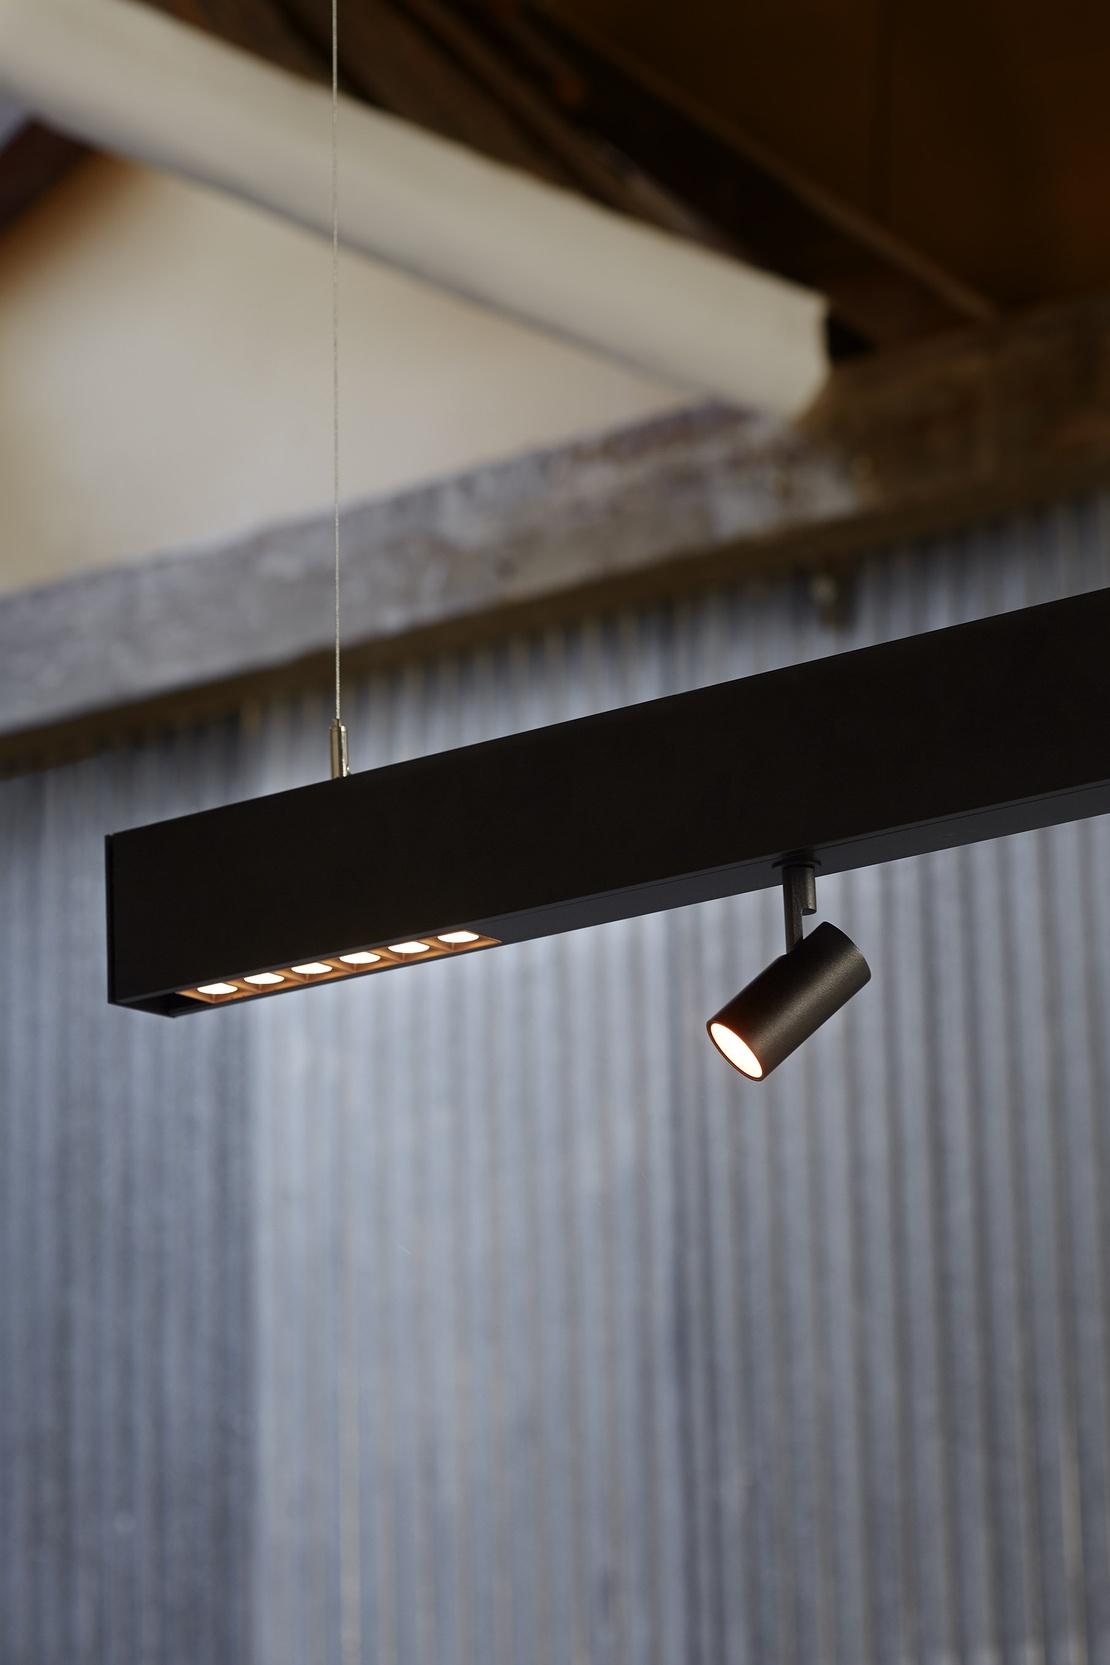 Lamp ocult system